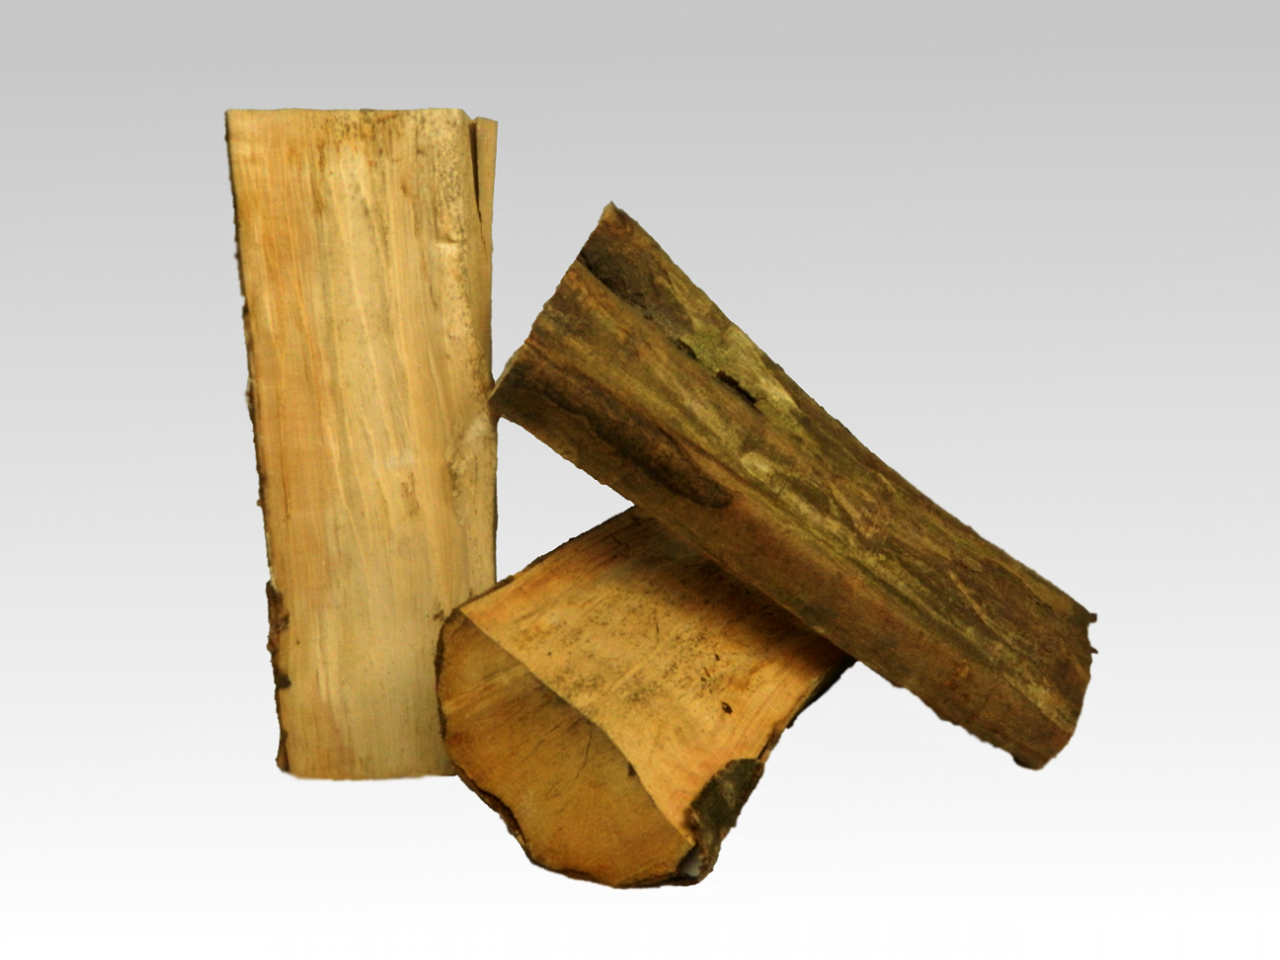 Aktionspreis bis 30.11.20 Hainbuchenholz 30-33cm , 3,2 SRM (2 RM ) auf Palette